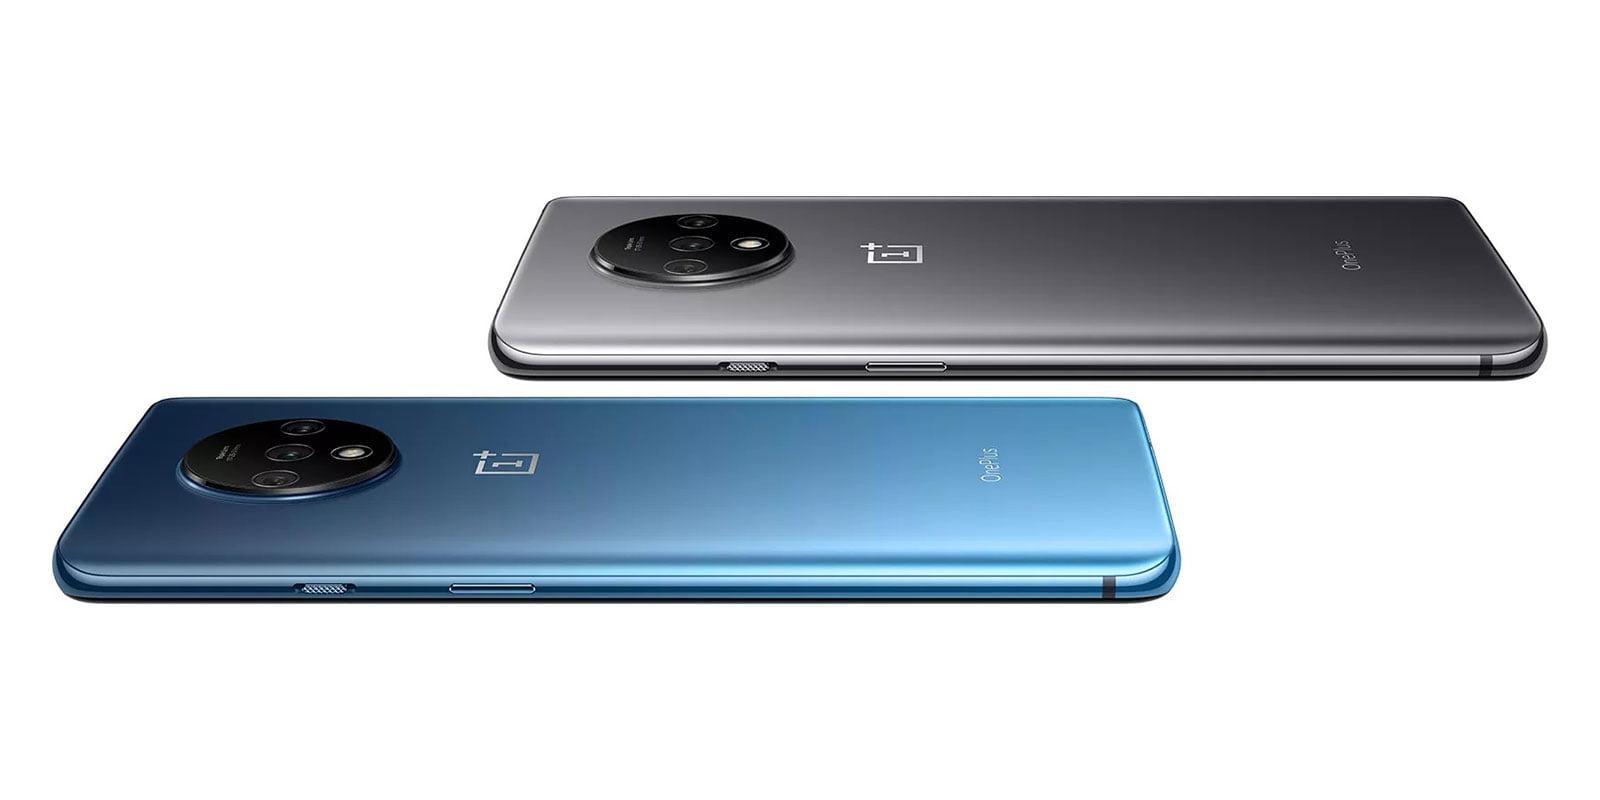 OnePlus 7T smartphone